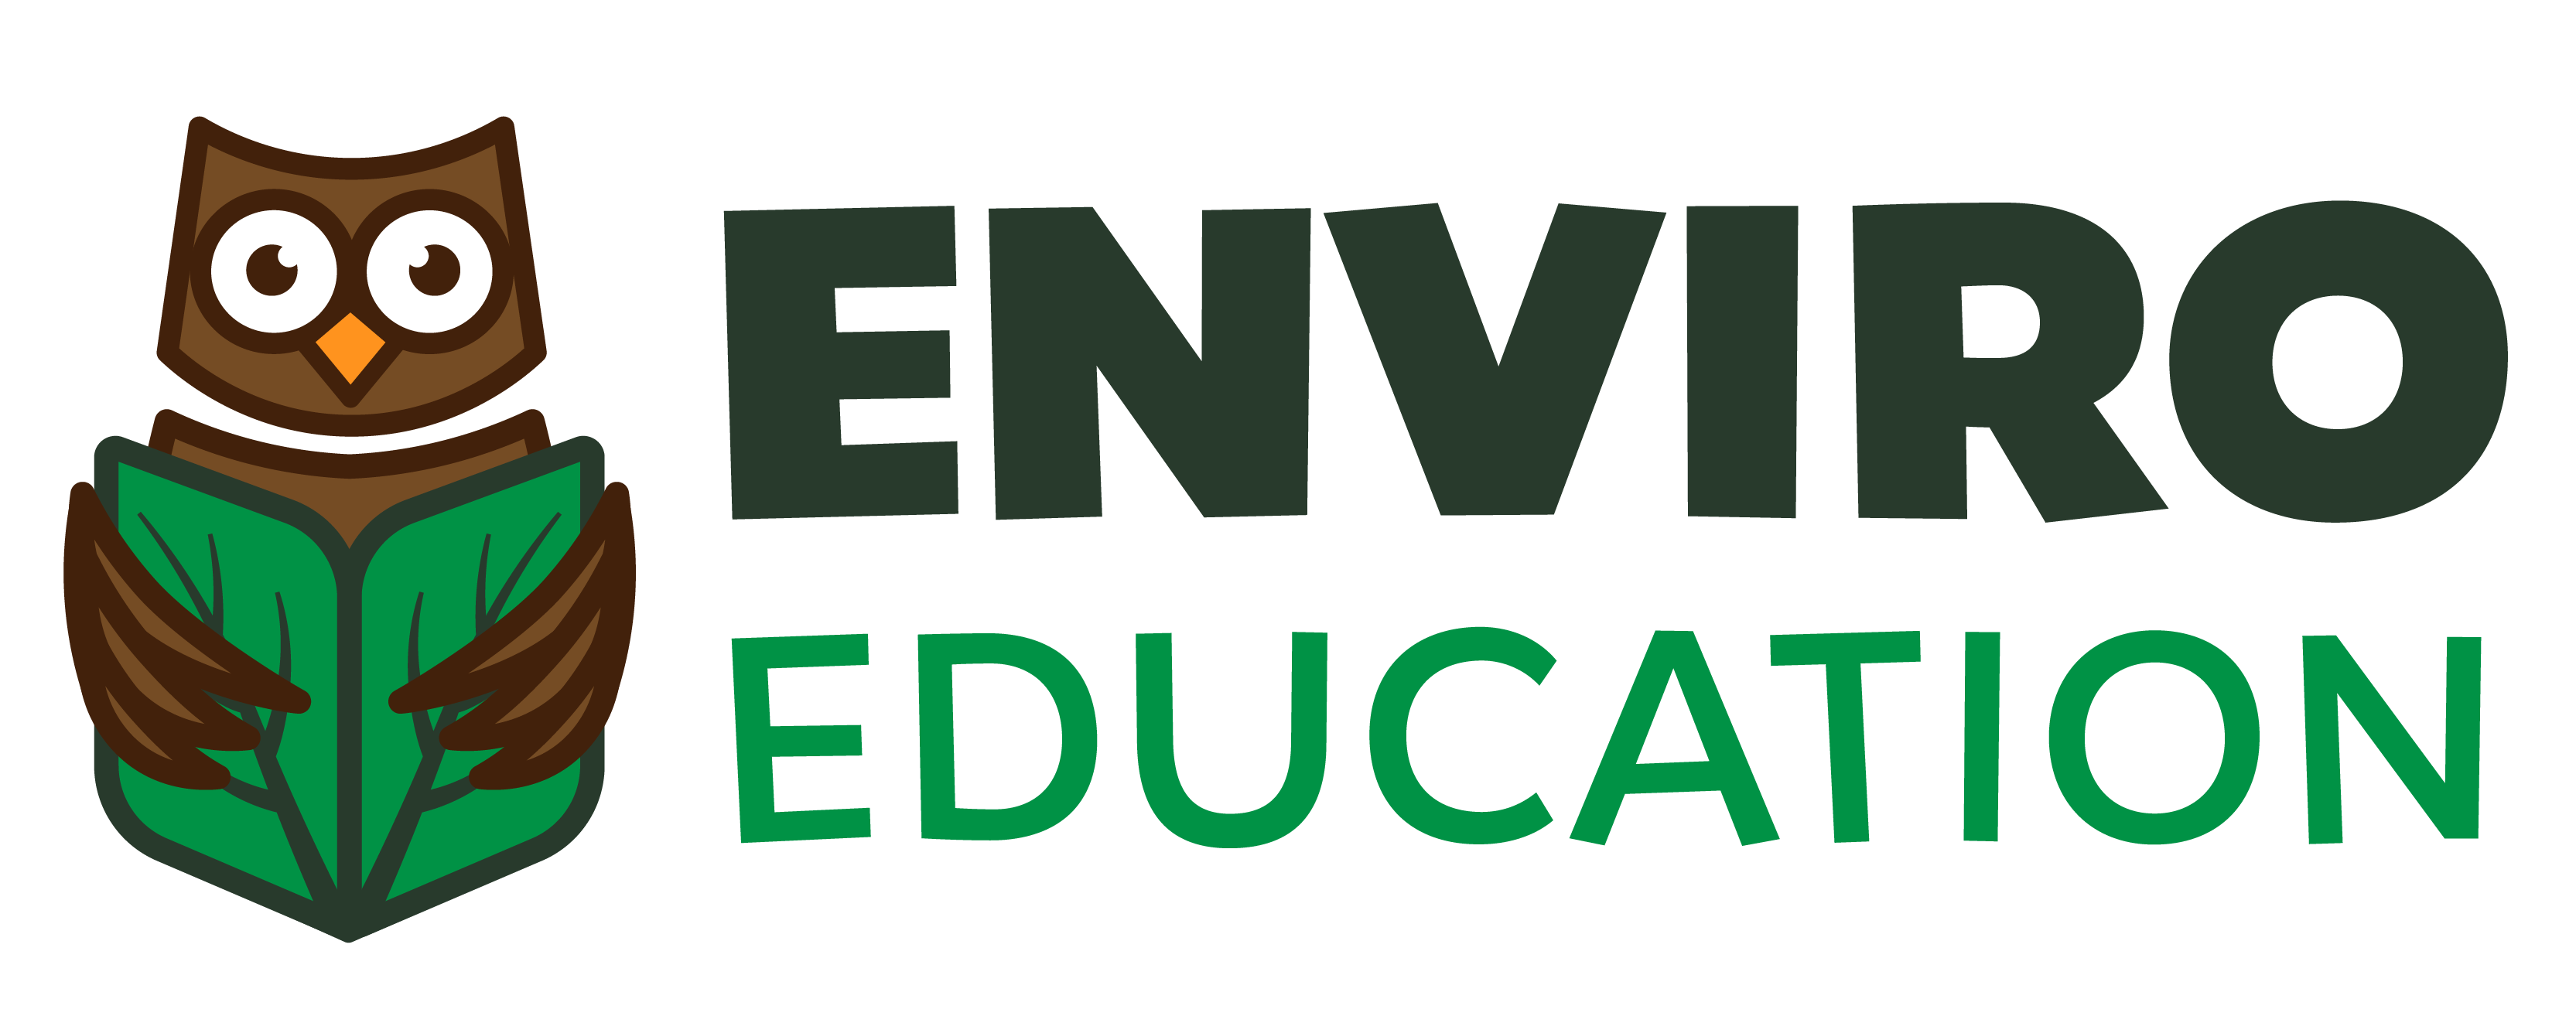 EnviroEducation logo